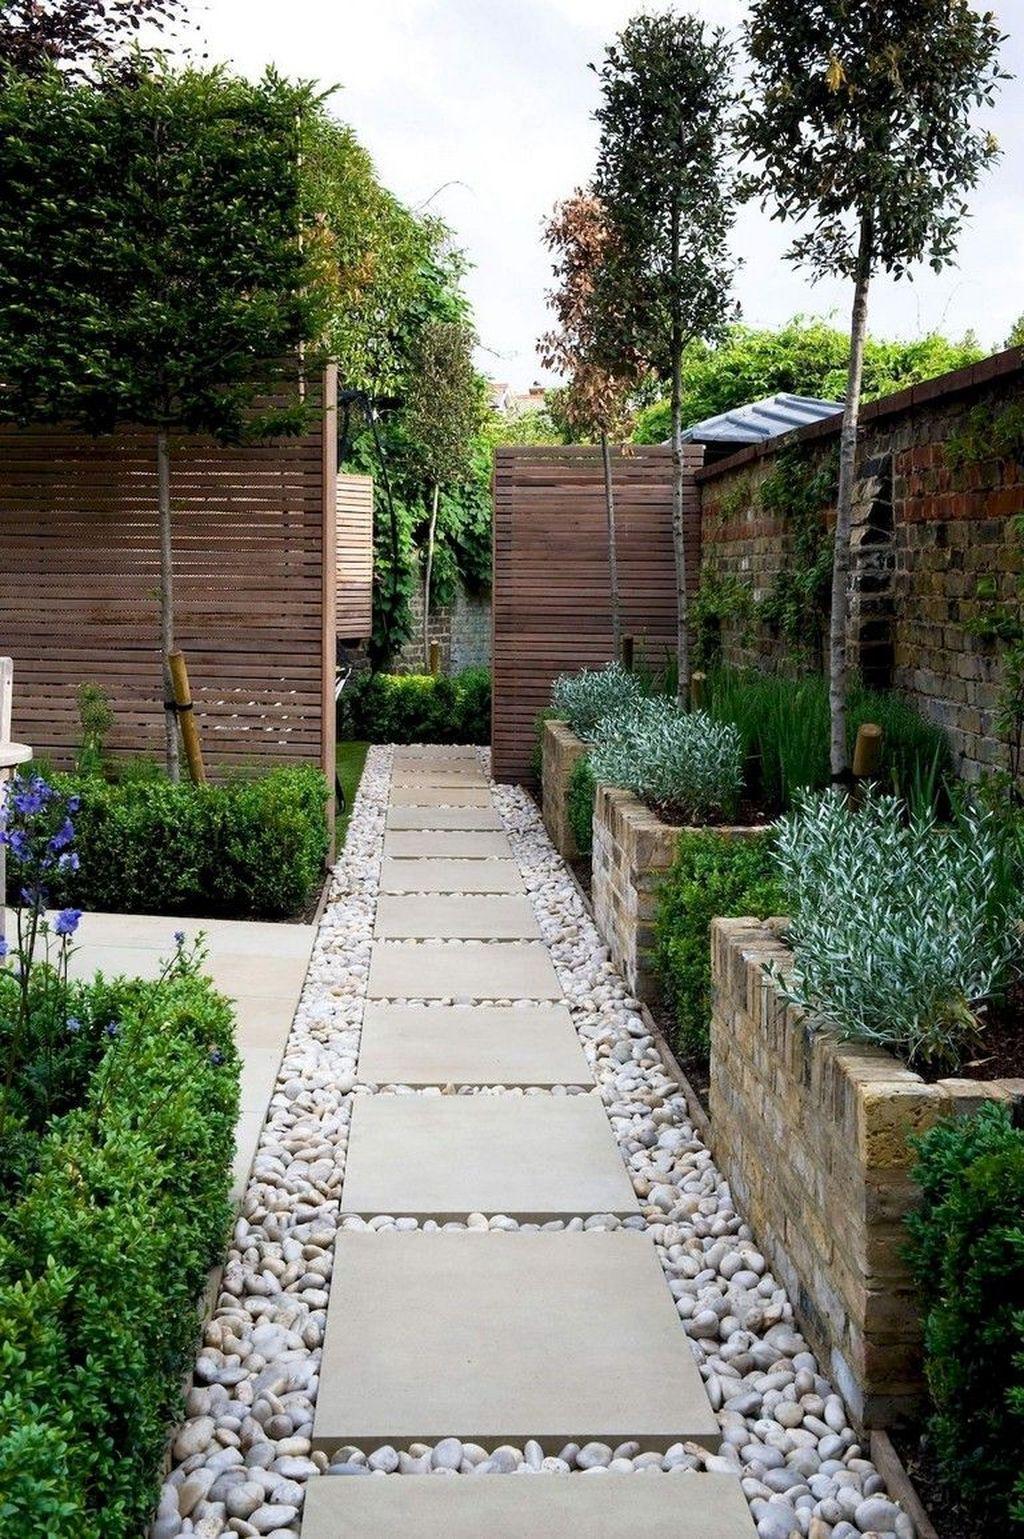 43 Beautiful Backyard Garden Landscaping Design Ideas To Try Asap Garden Landscape Design Small Garden Design Small Backyard Garden Design Backyard garden and design ideas